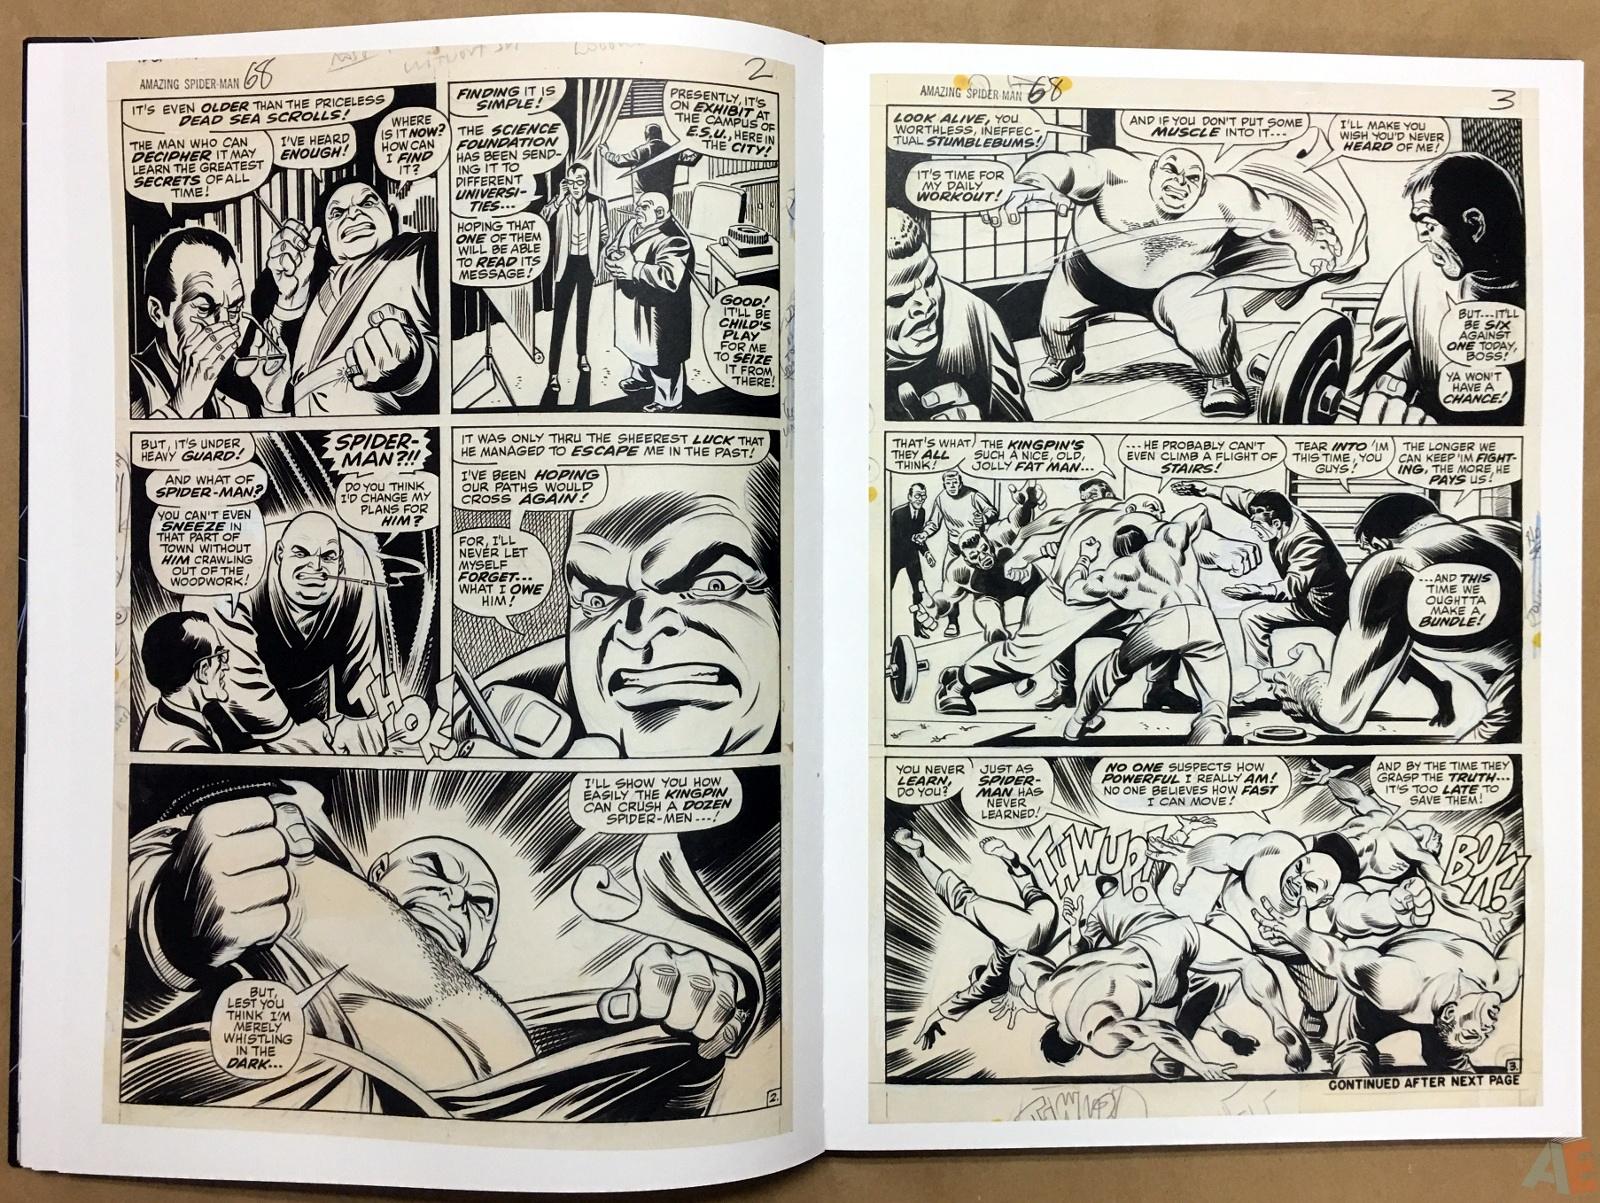 John Romita's The Amazing Spider-Man Artist's Edition 14